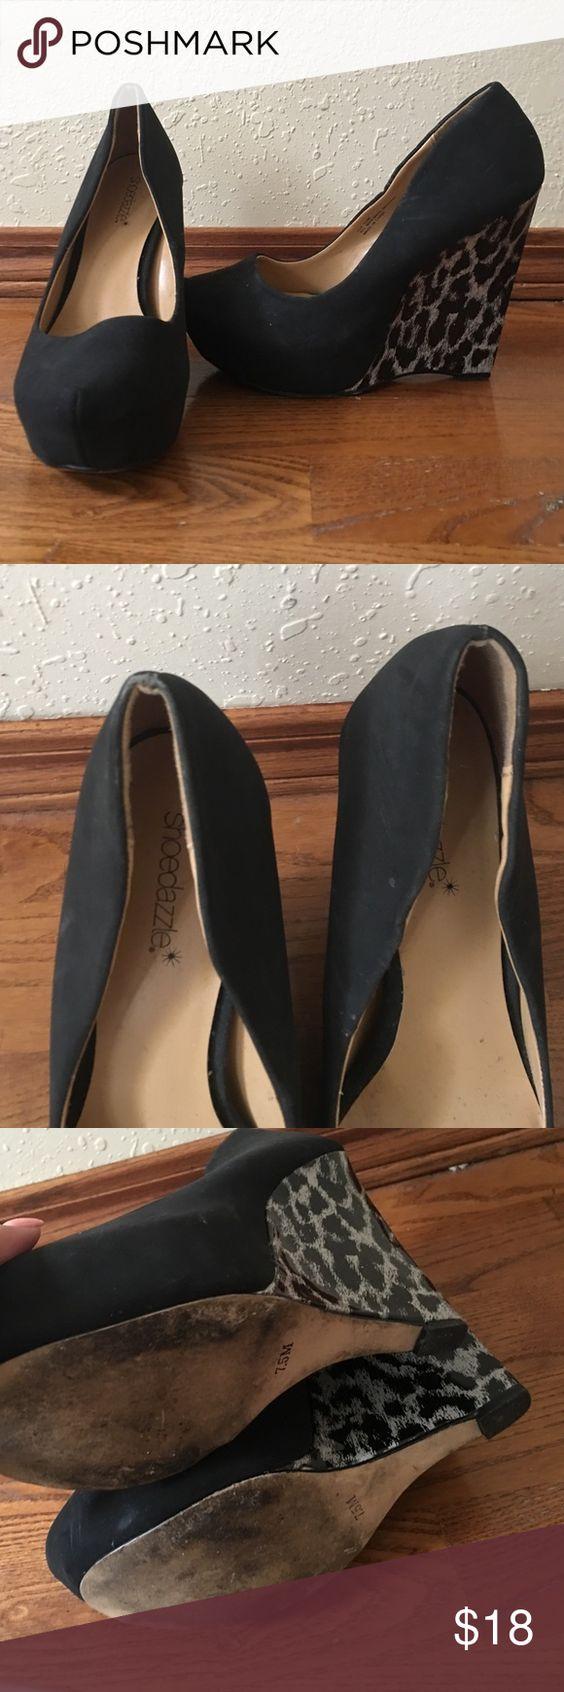 Original line of Shoe Dazzle wedges. Cheetah and black multi wedges. No trades please. Shoe Dazzle Shoes Wedges